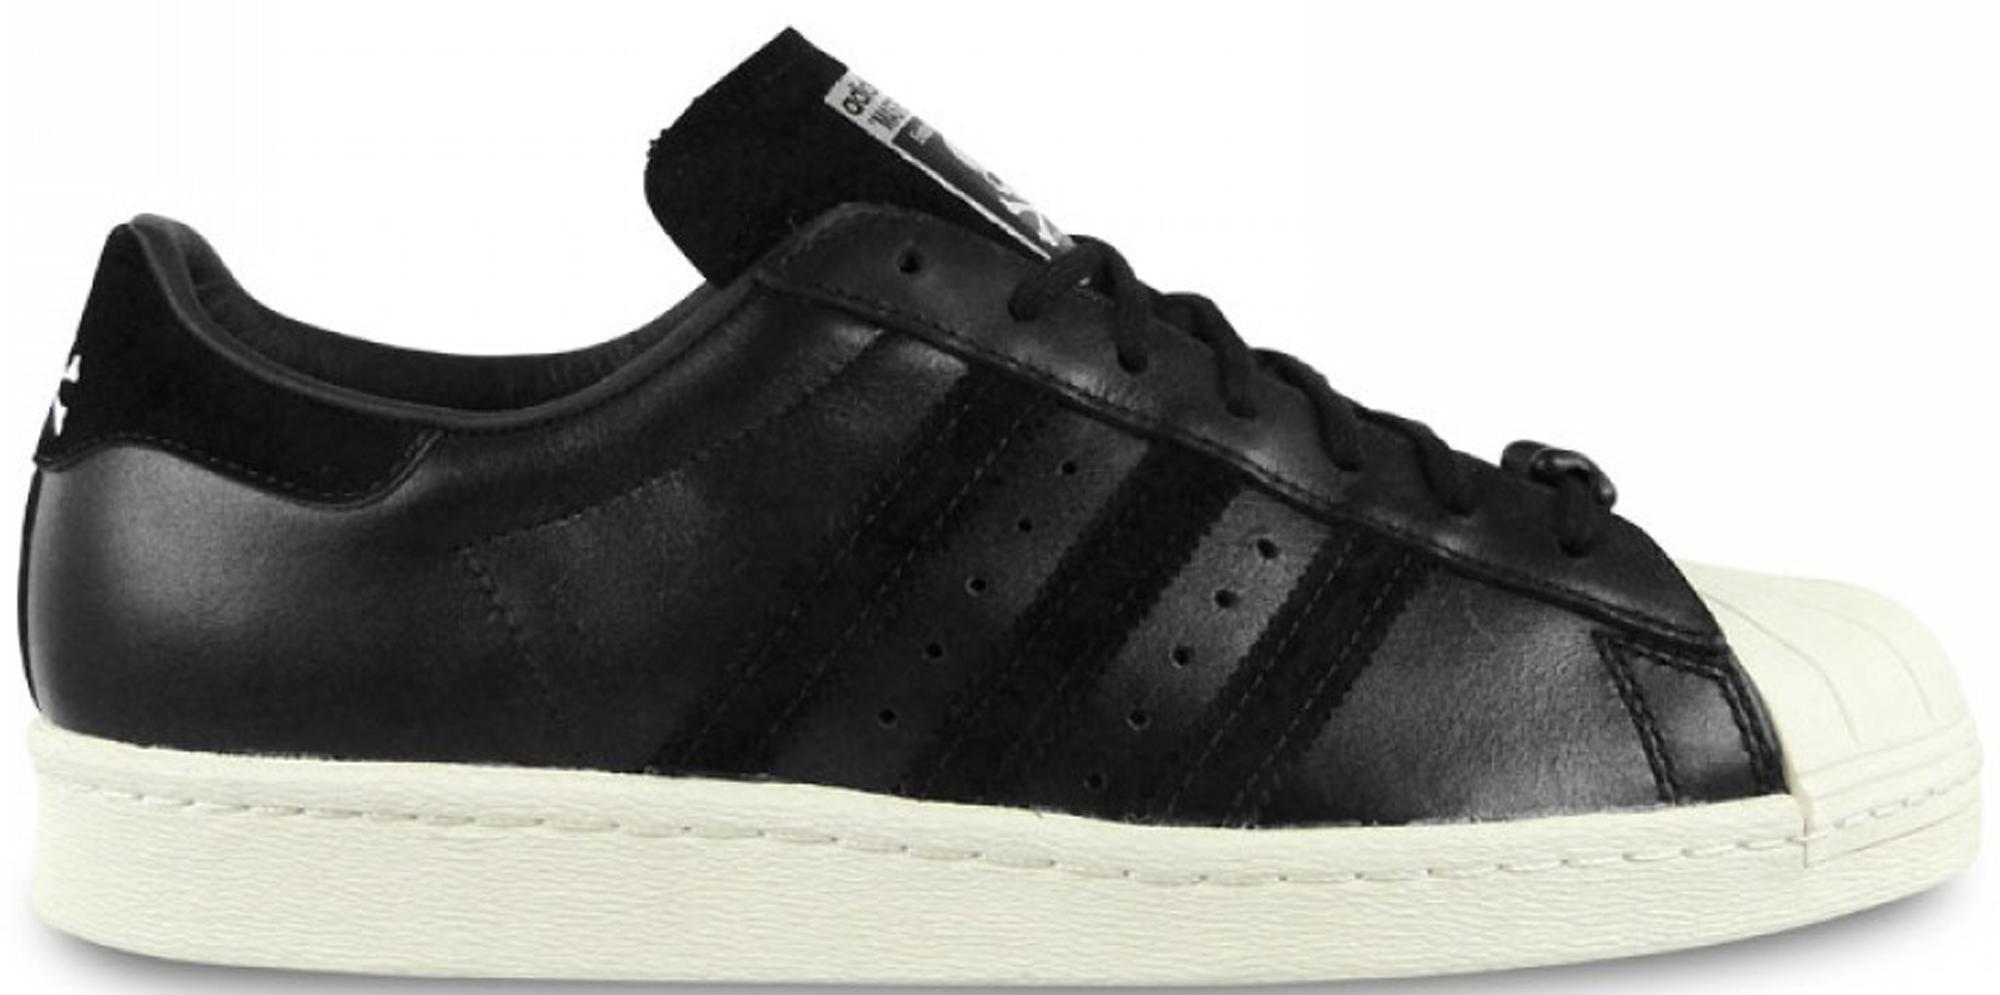 adidas Superstar 80s mastermind Black